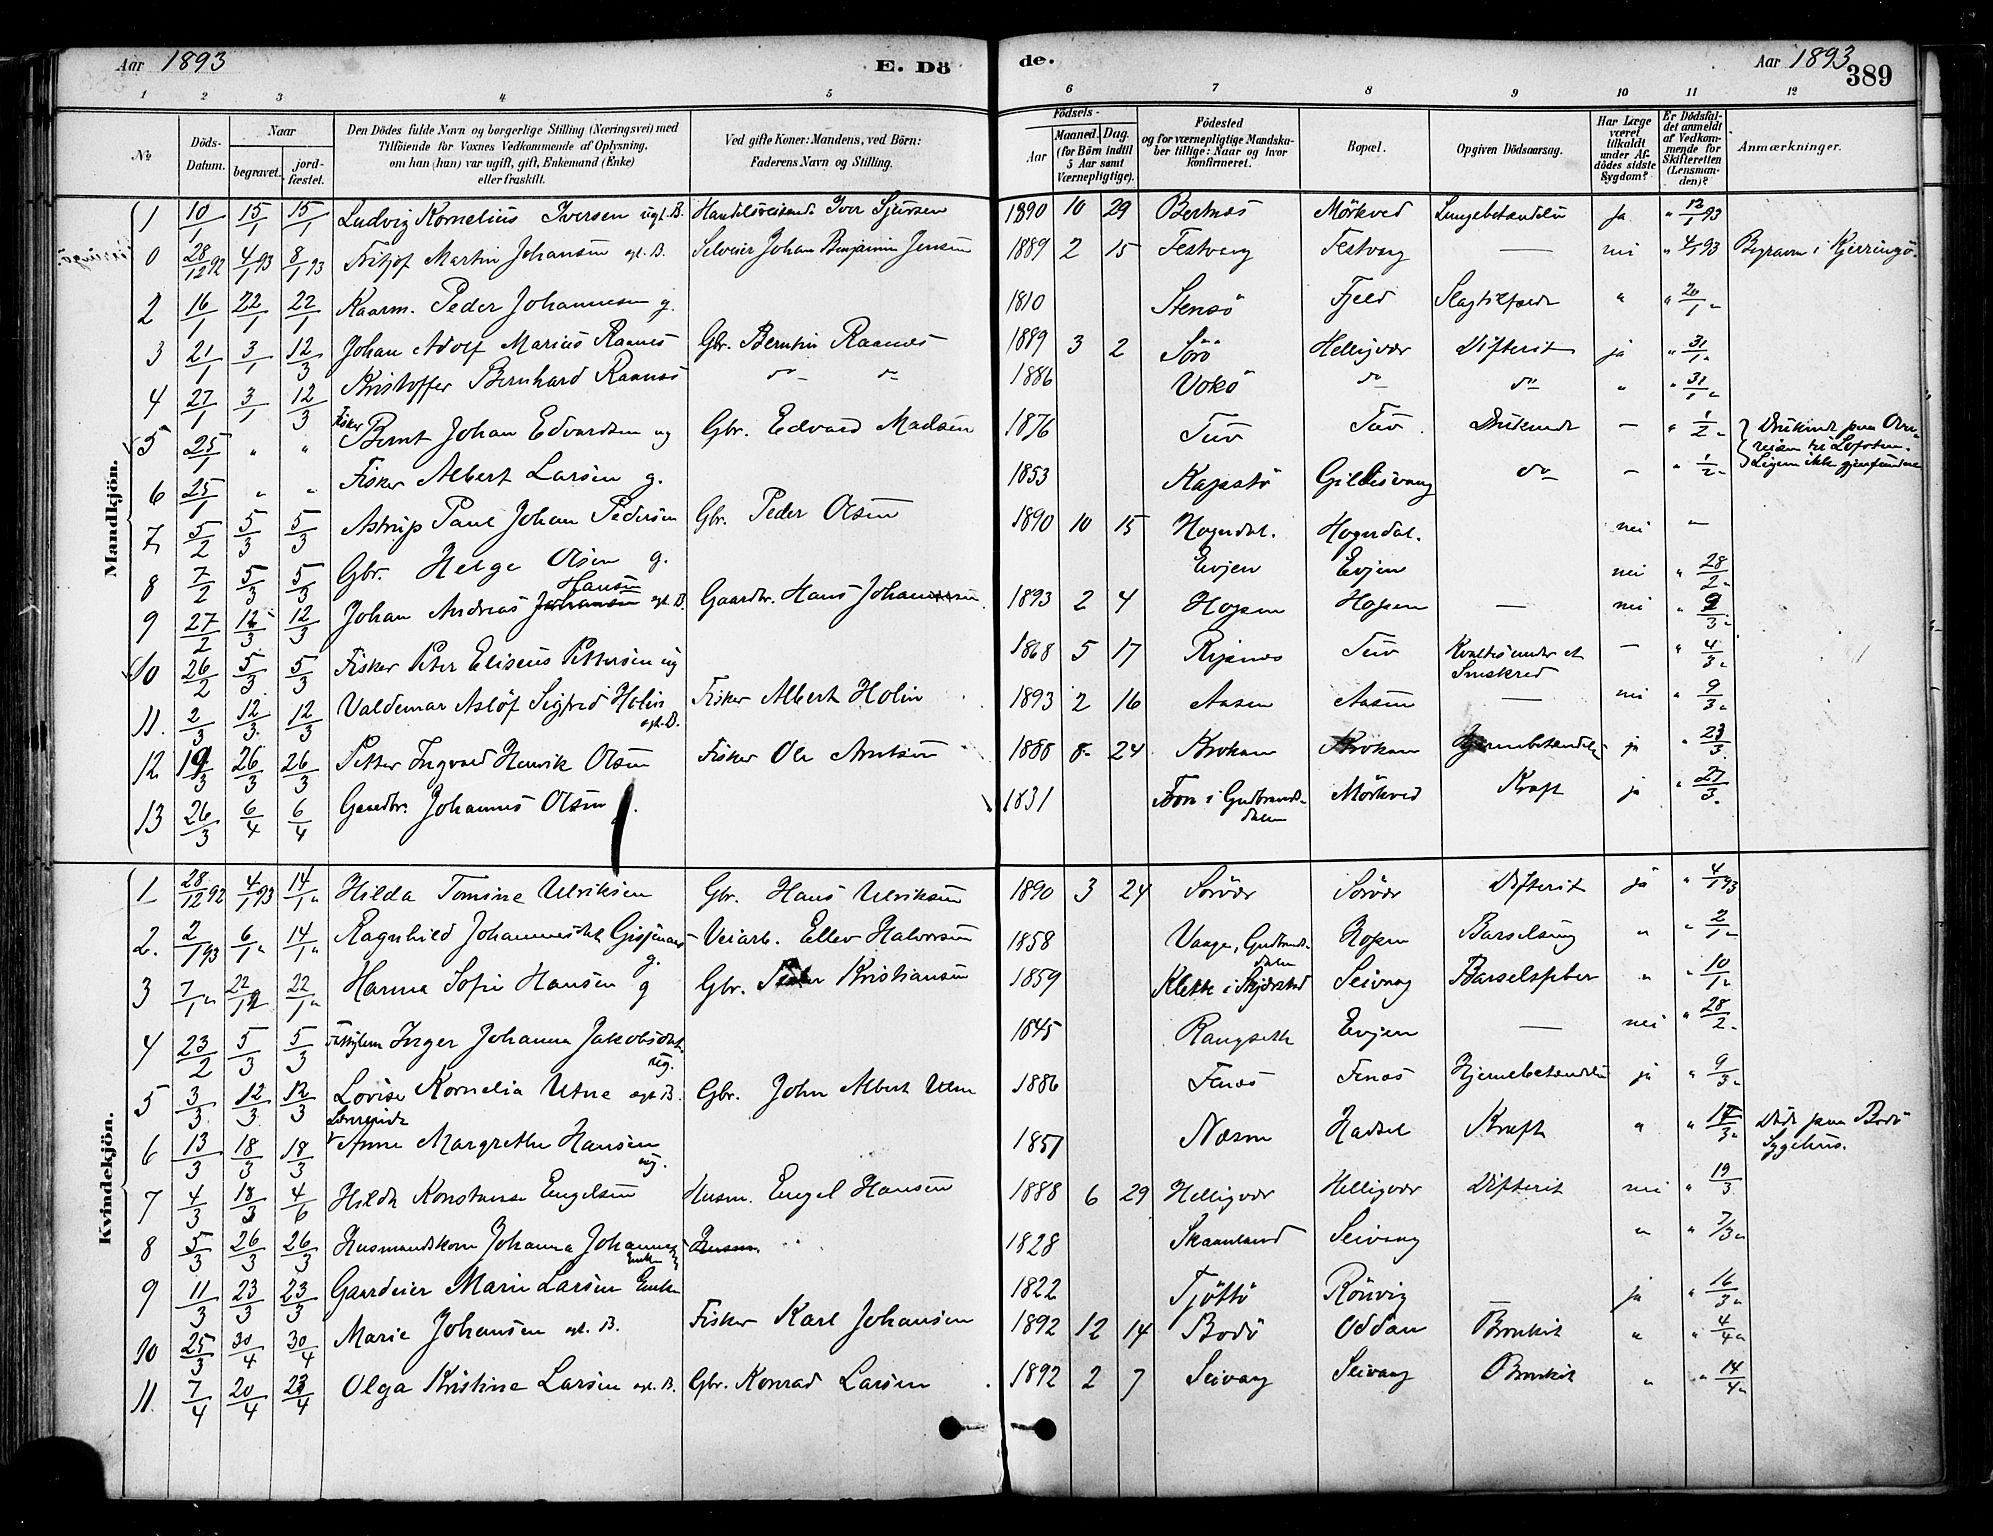 SAT, Ministerialprotokoller, klokkerbøker og fødselsregistre - Nordland, 802/L0054: Ministerialbok nr. 802A01, 1879-1893, s. 389